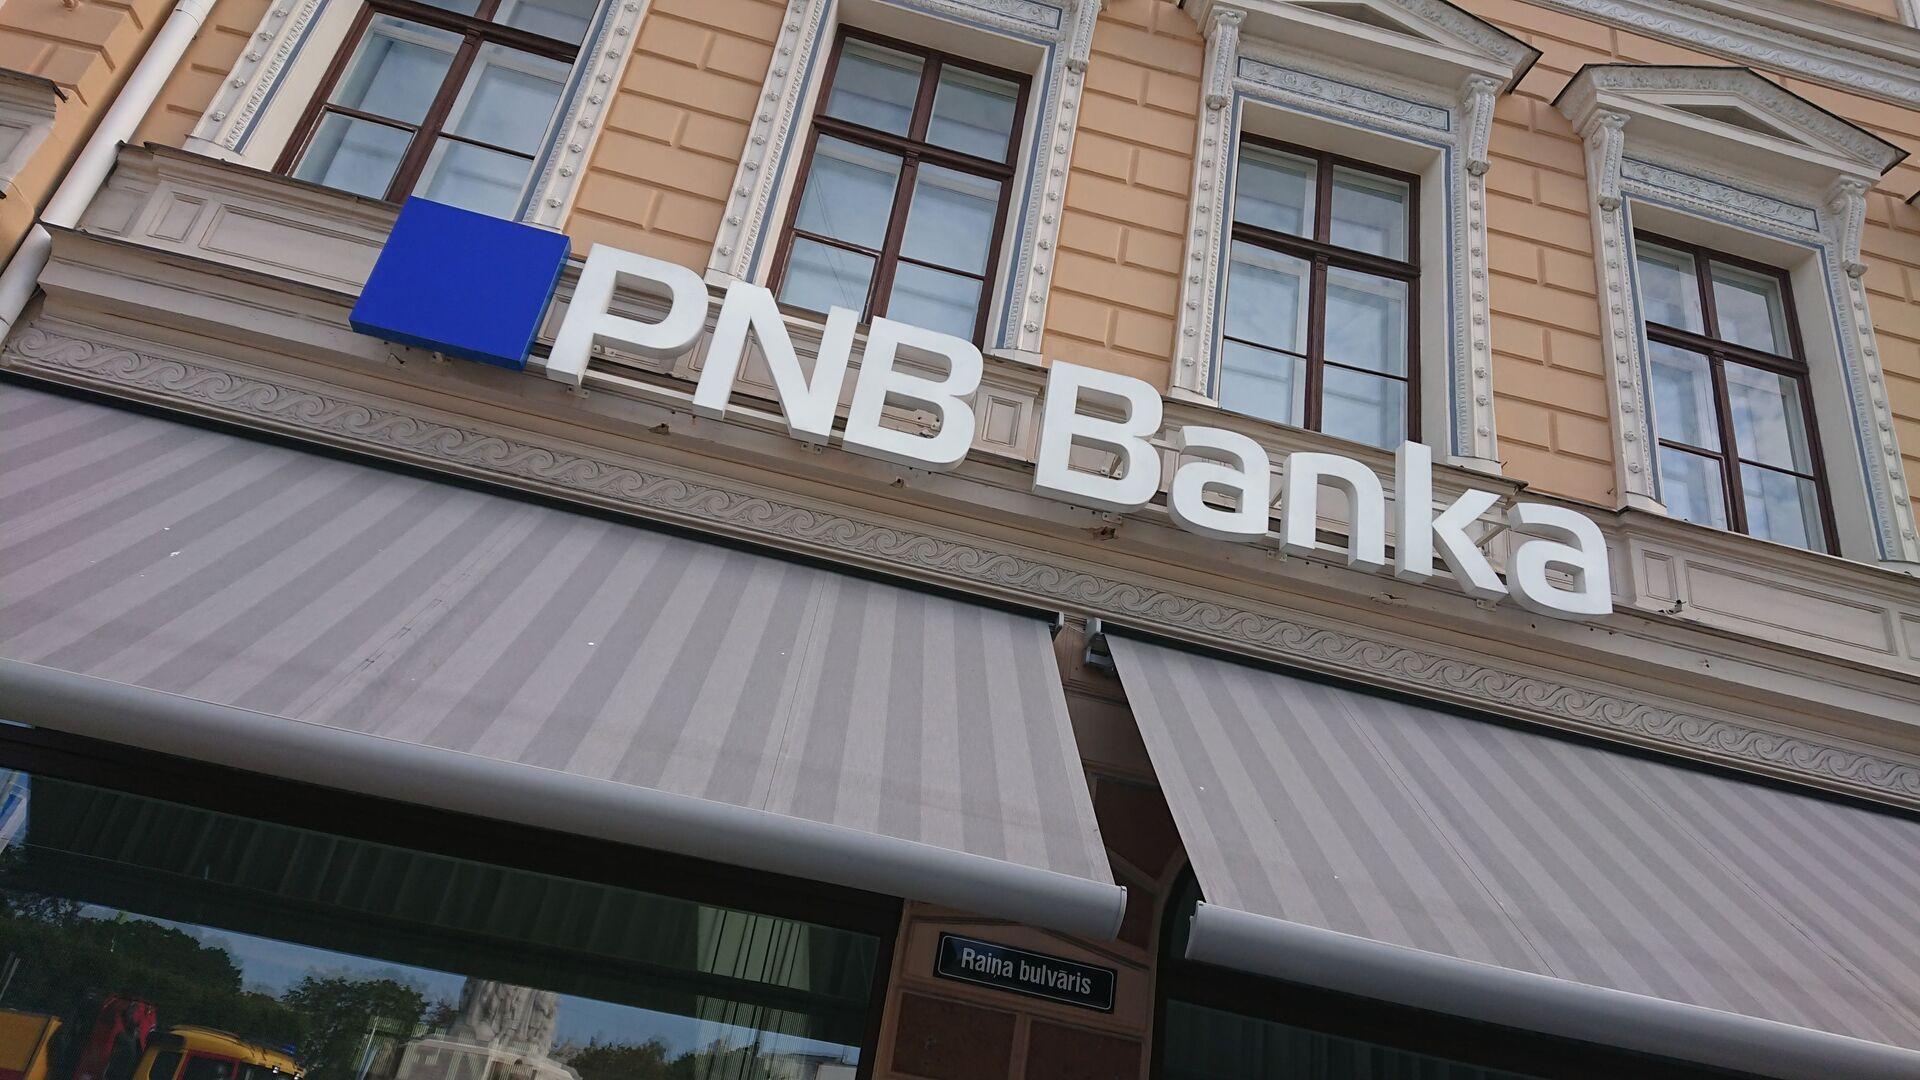 PNB Banka в Риге - Sputnik Латвия, 1920, 18.06.2021